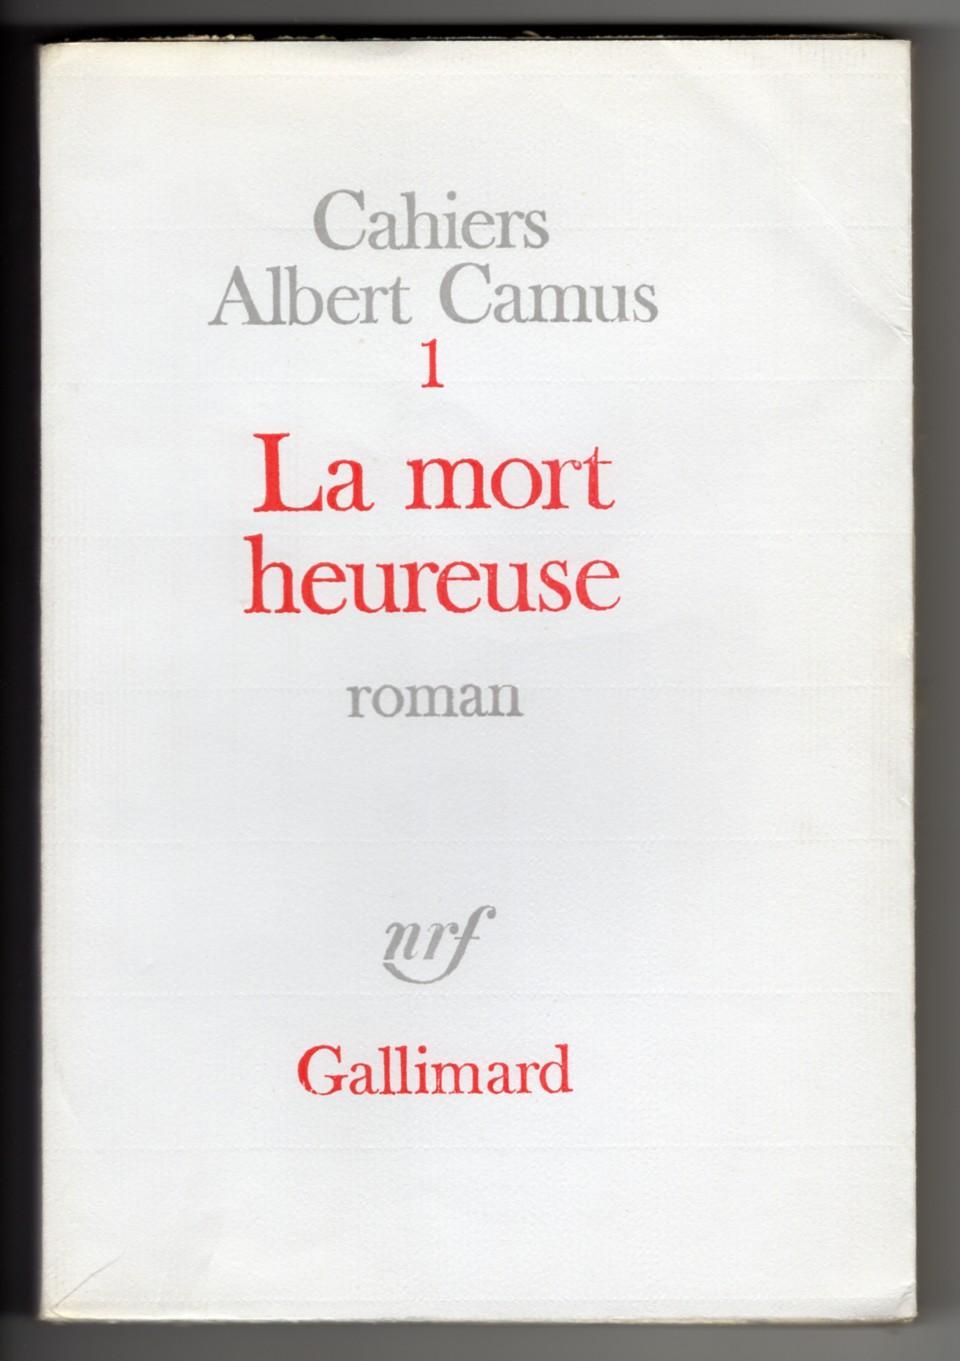 Cahiers Albert Camus 1: LA MORT HEUREUSE. Roman CAMUS, Albert